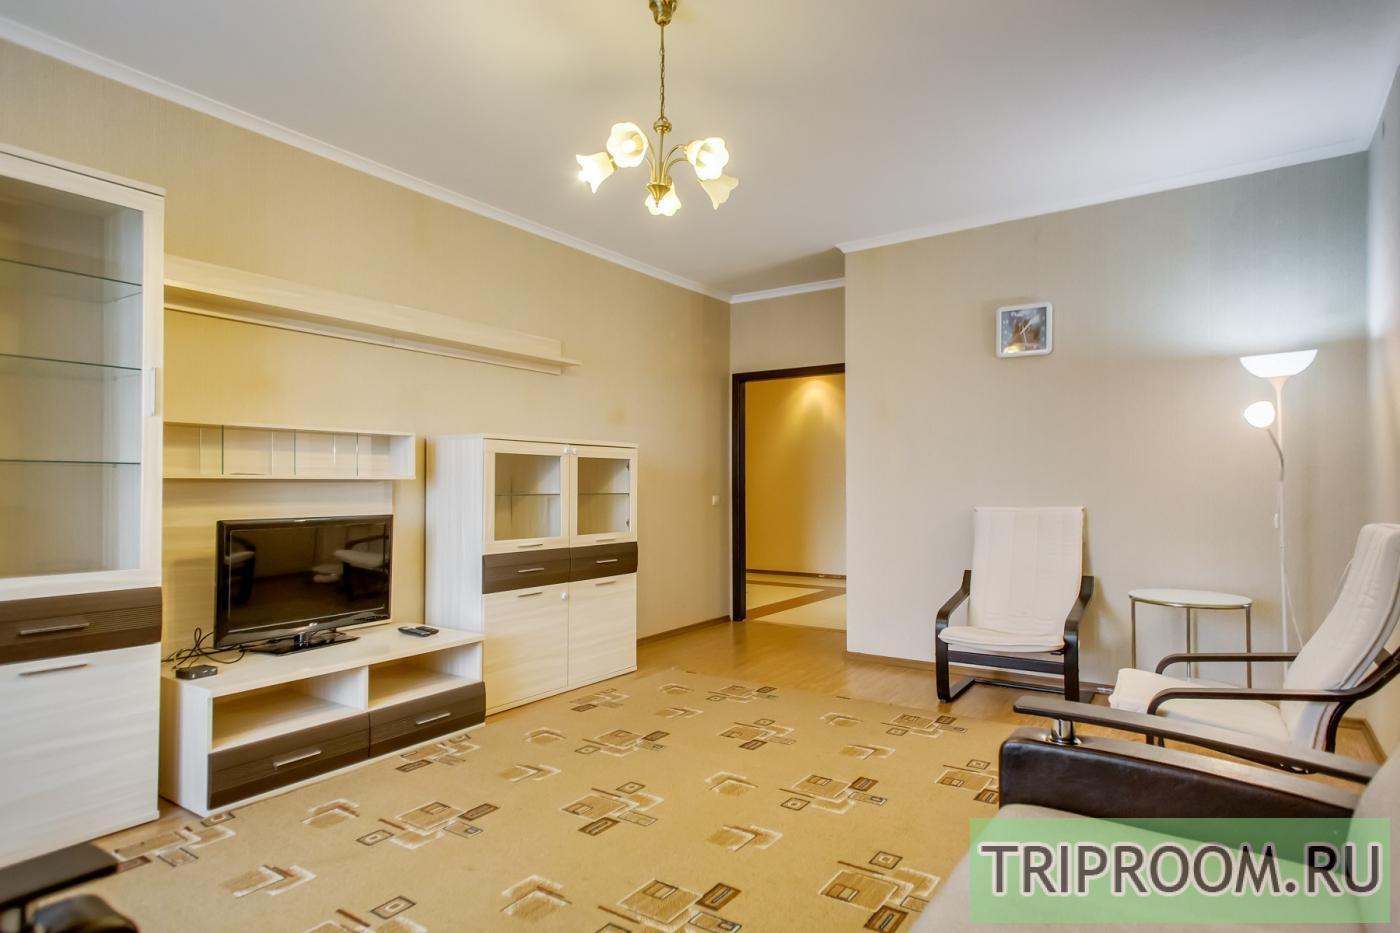 2-комнатная квартира посуточно (вариант № 23730), ул. Максима Горького улица, фото № 8